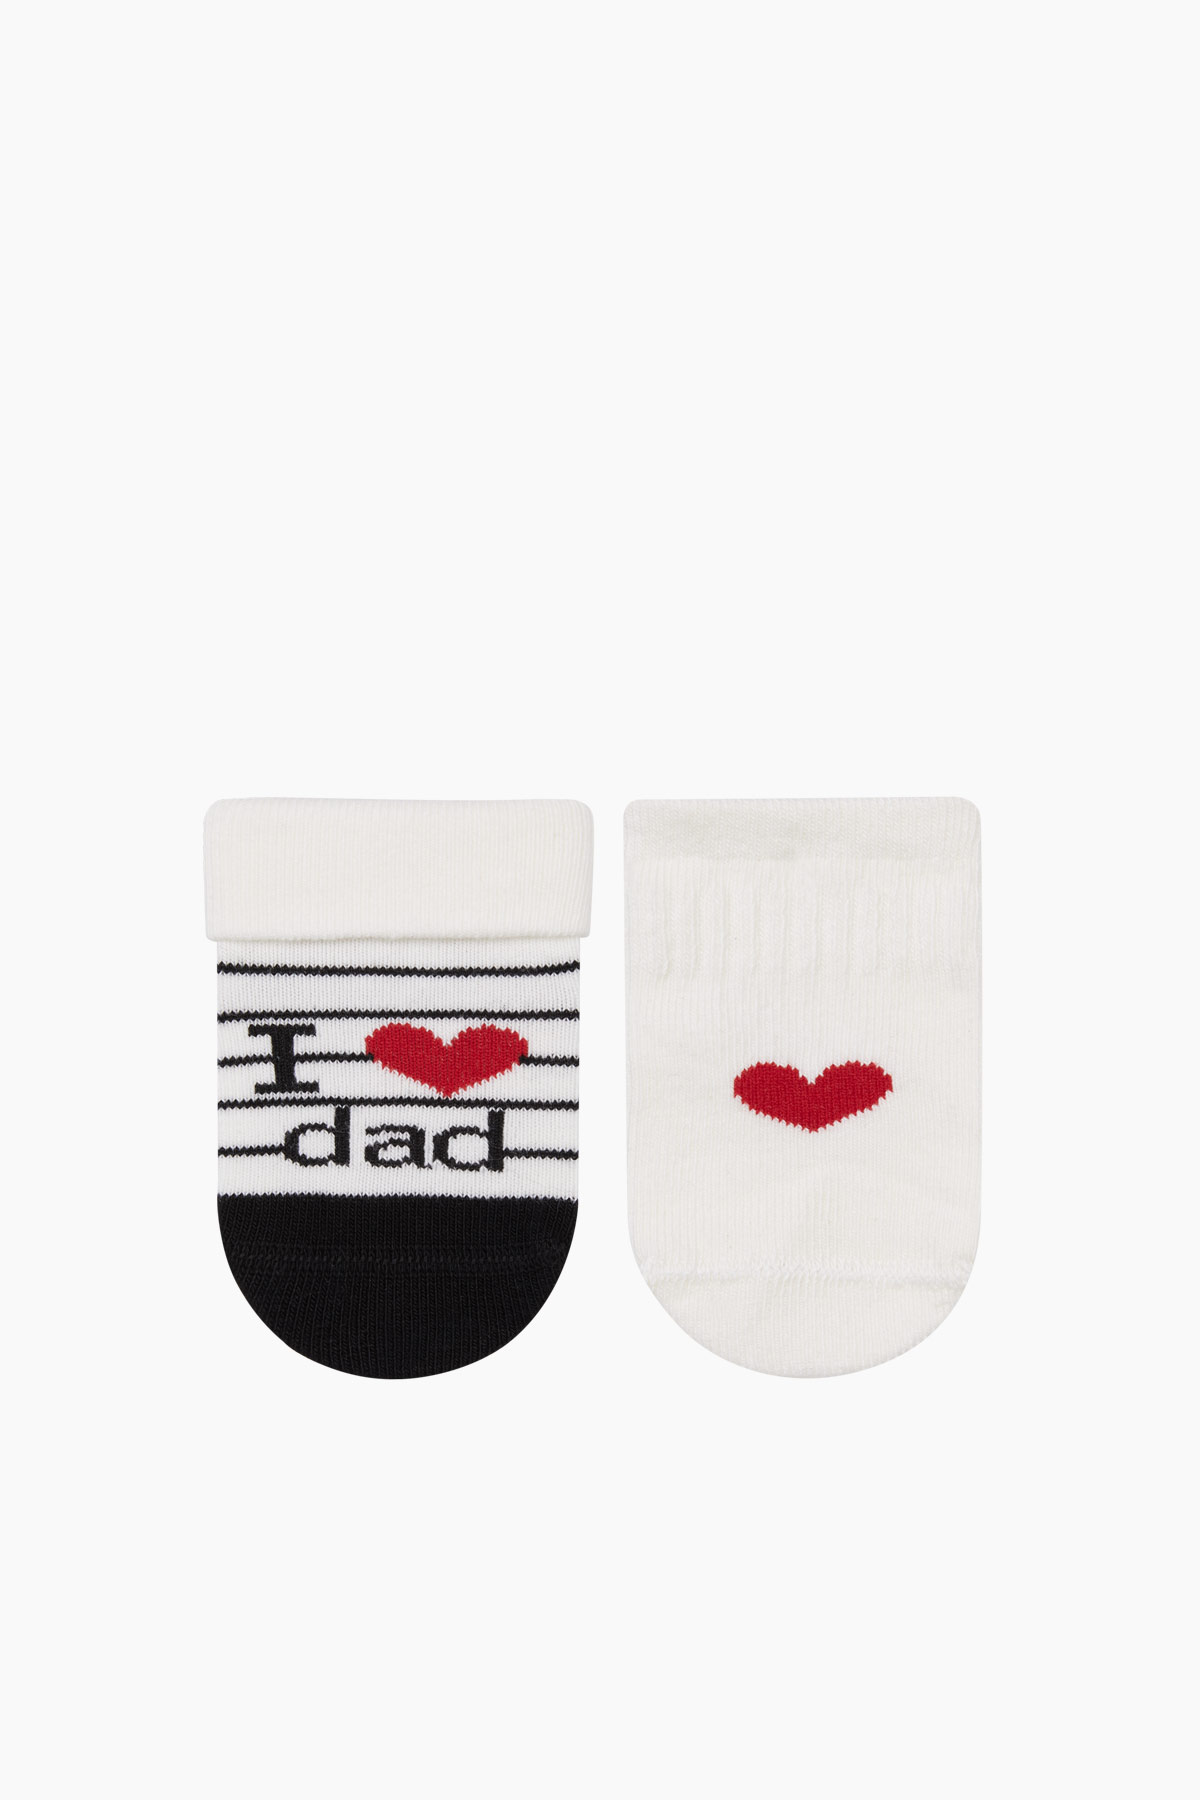 Bross - Bross 2er Pack Neugeborene Handschuhe und Socken kombinieren